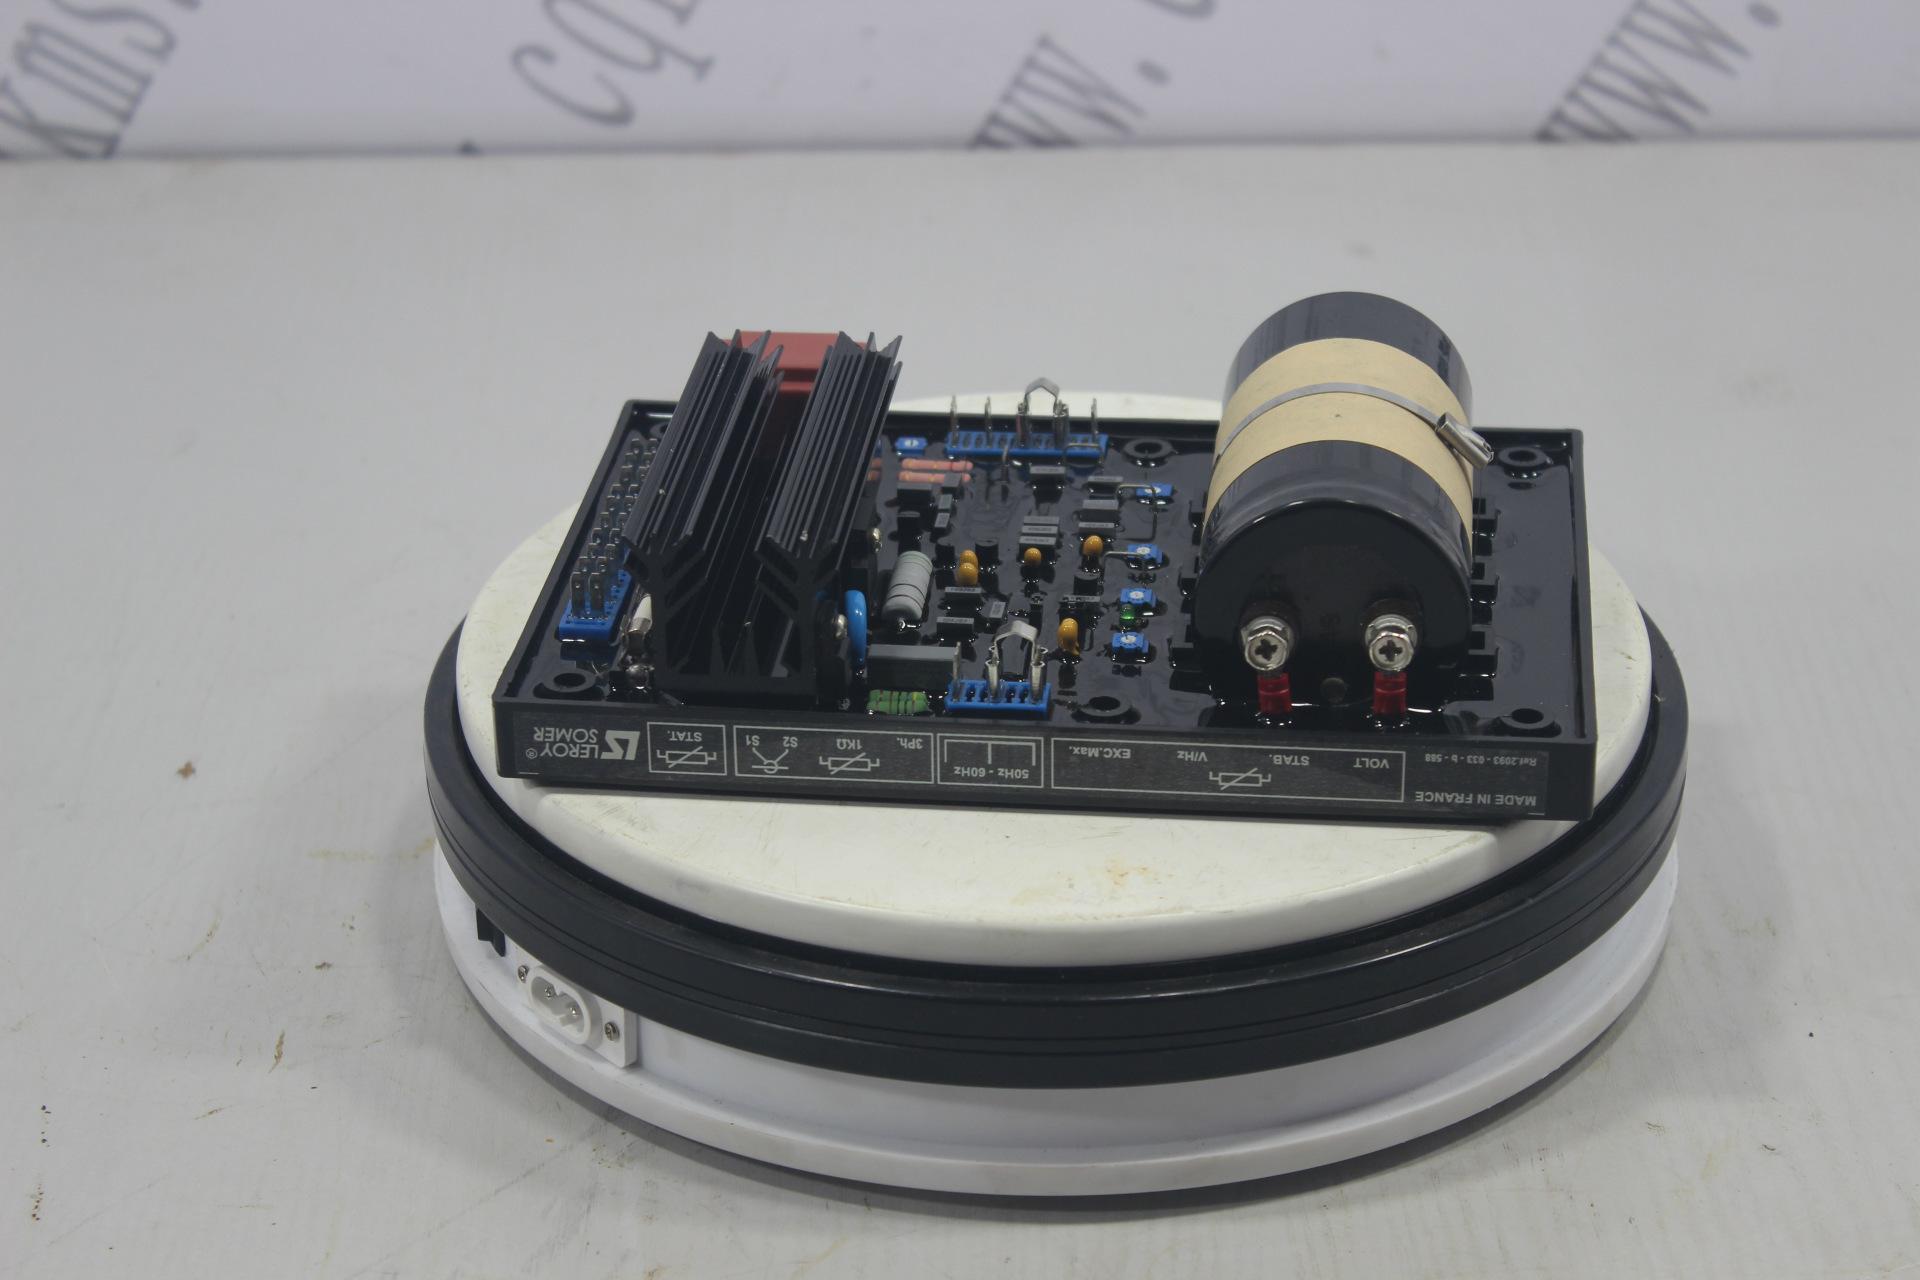 kms01445-R448-自动电压调节器图片4